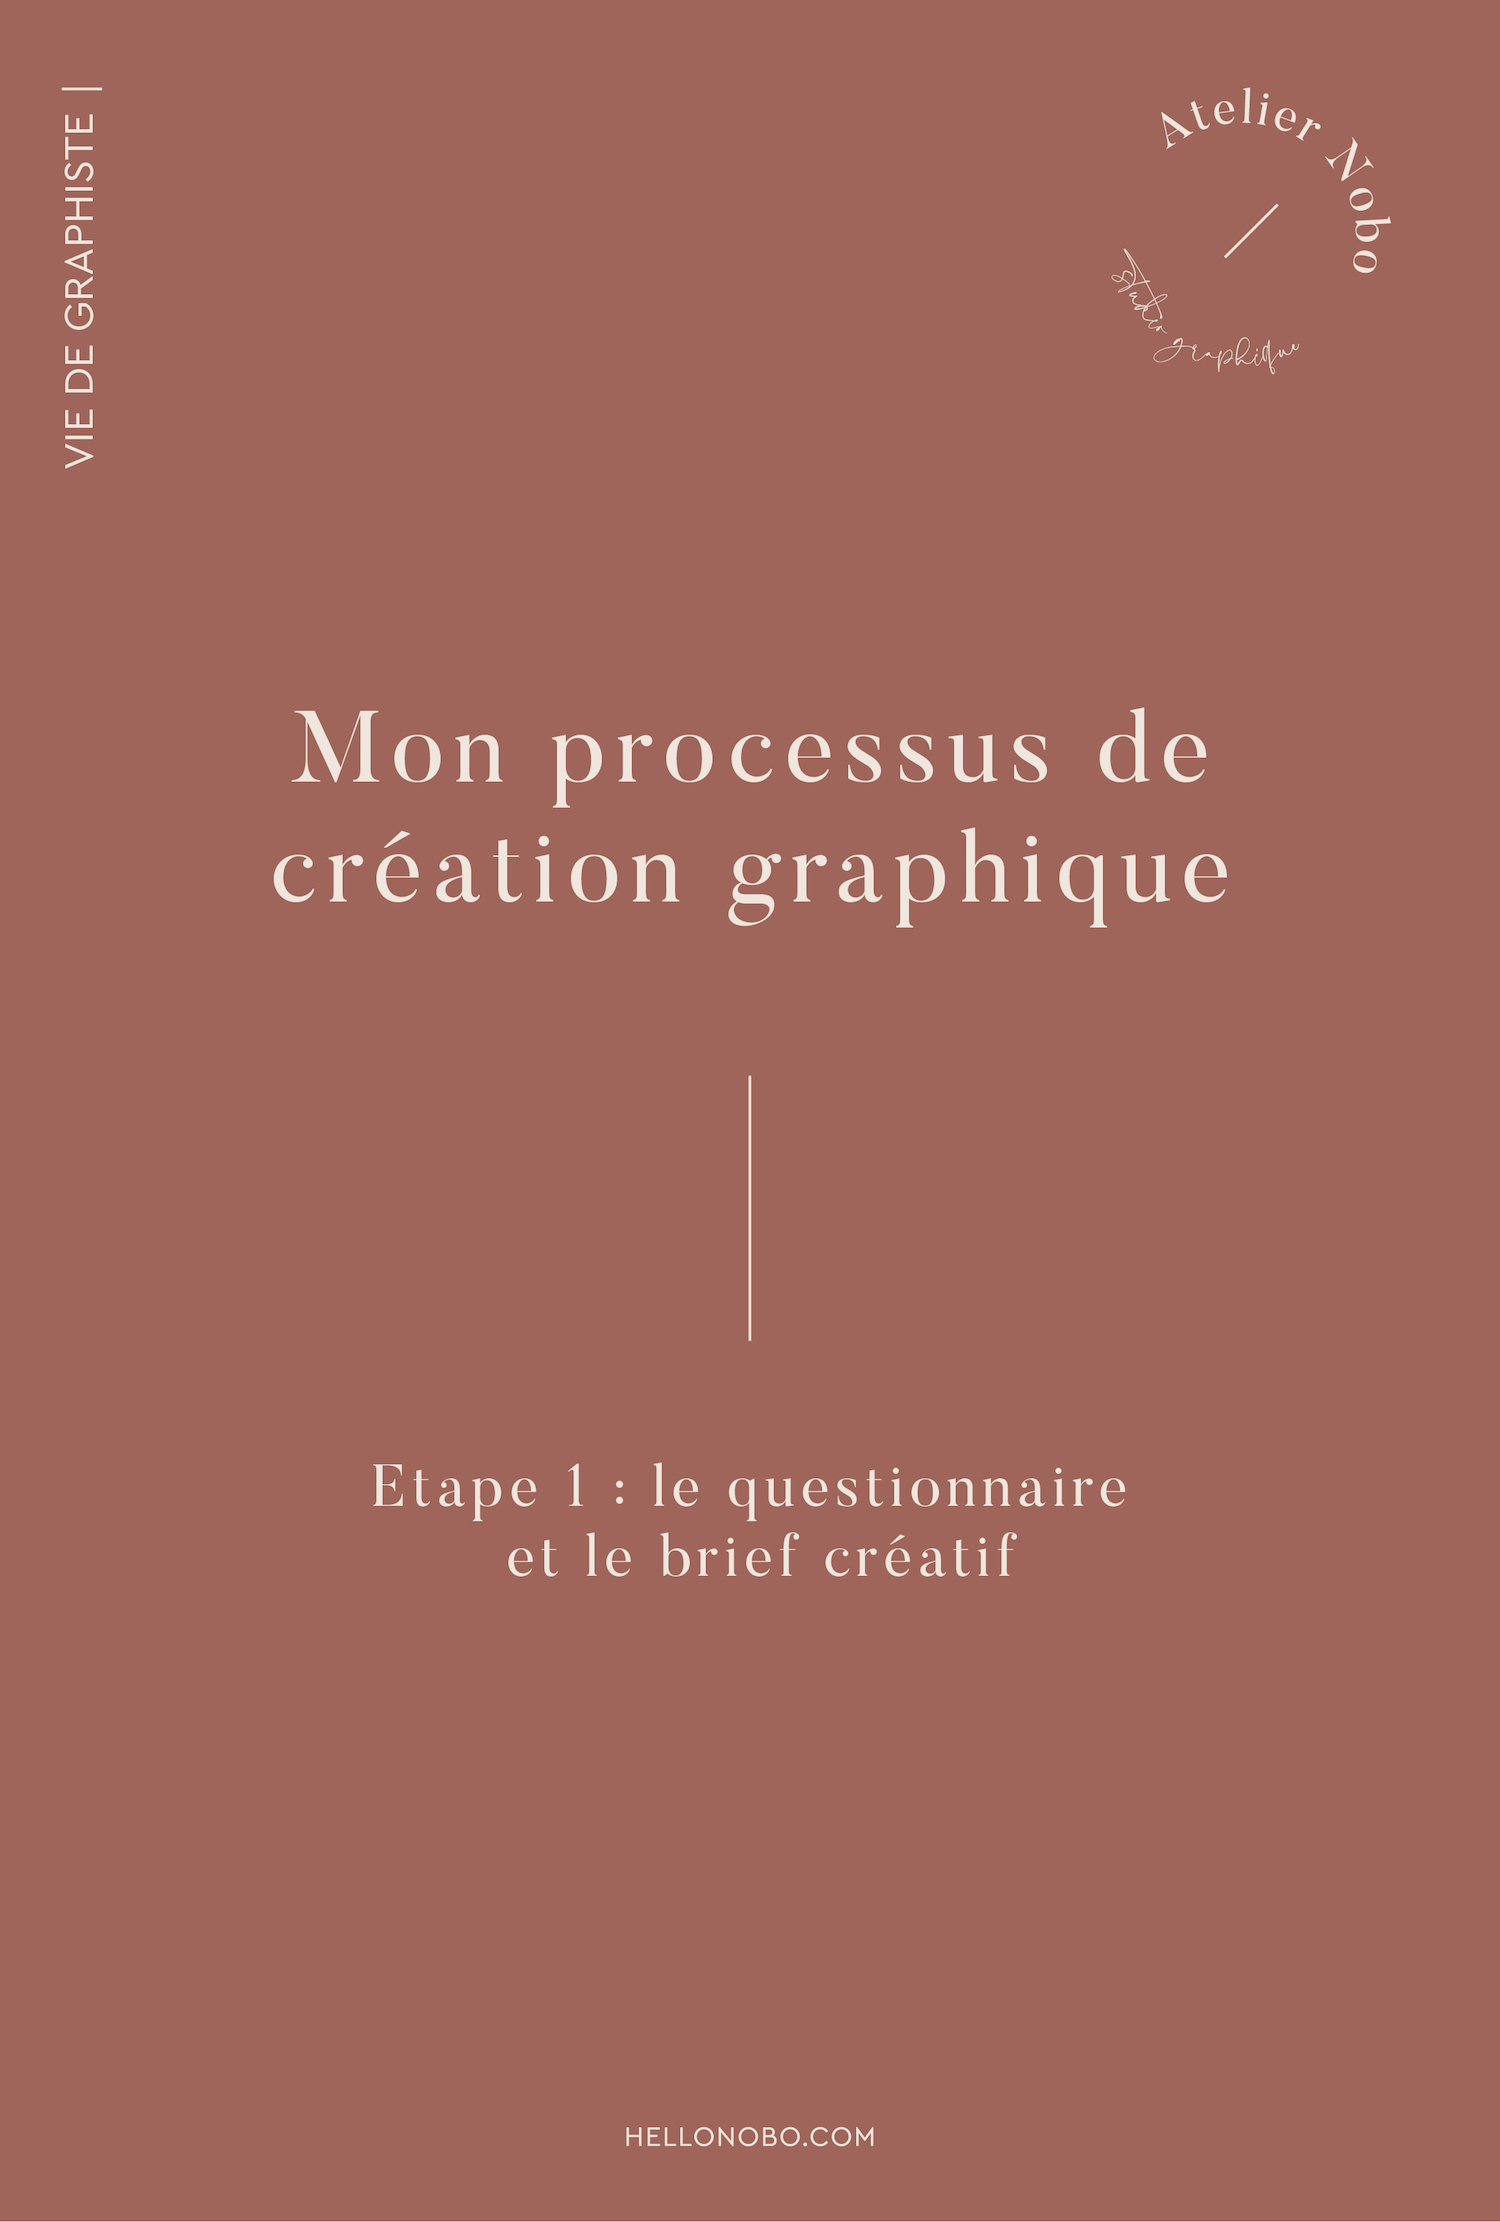 processus de creation graphique.jpg